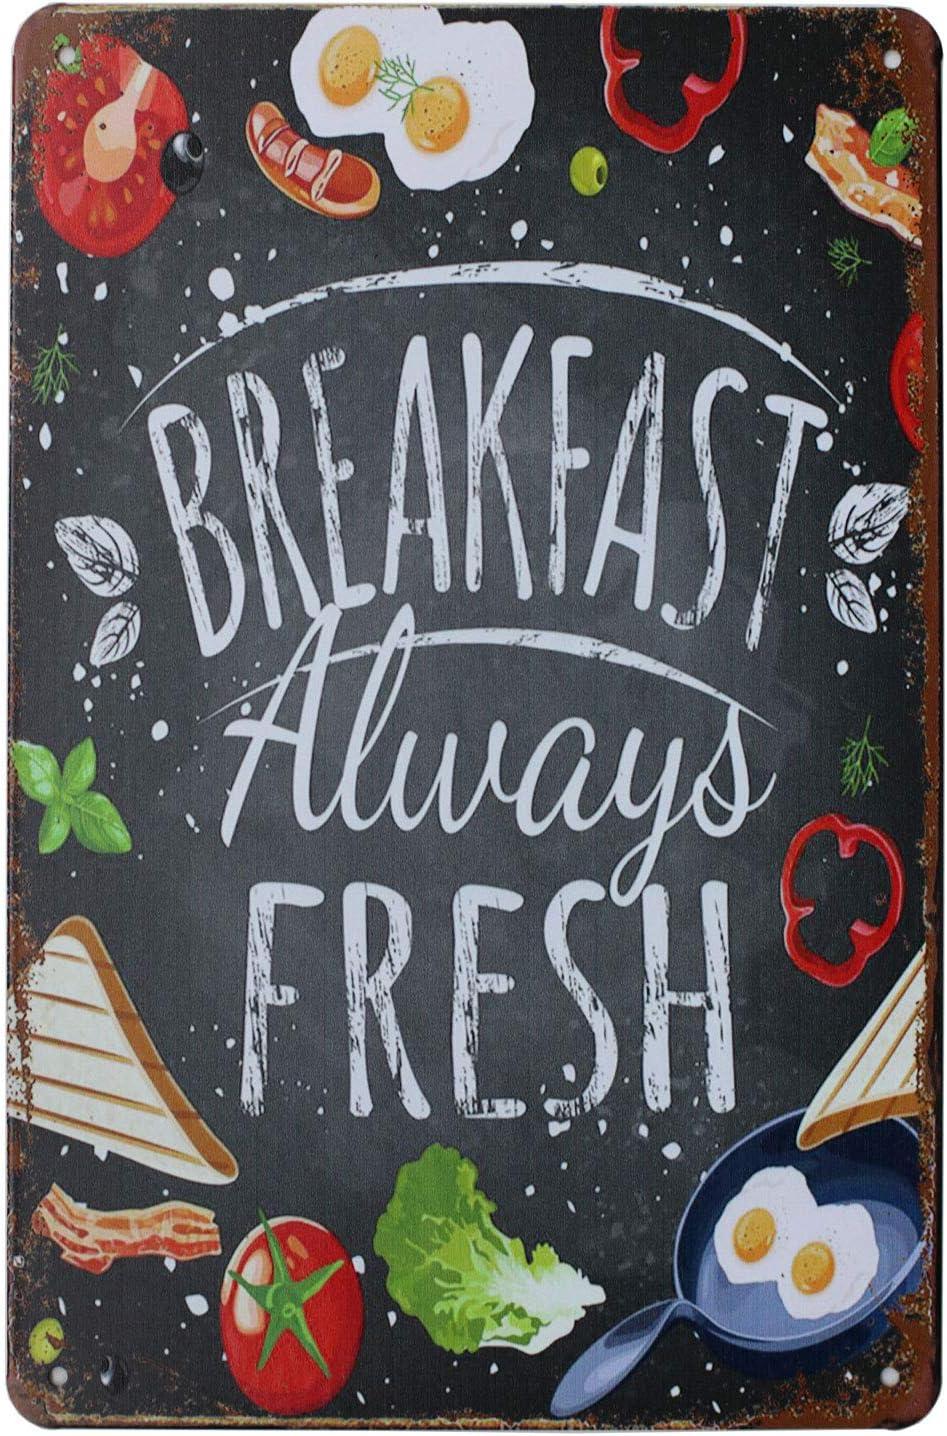 SUMIK Breakfast Always Fresh Organic Food, Metal Tin Sign, Vintage Art Poster Plaque Kitchen Home Wall Decor